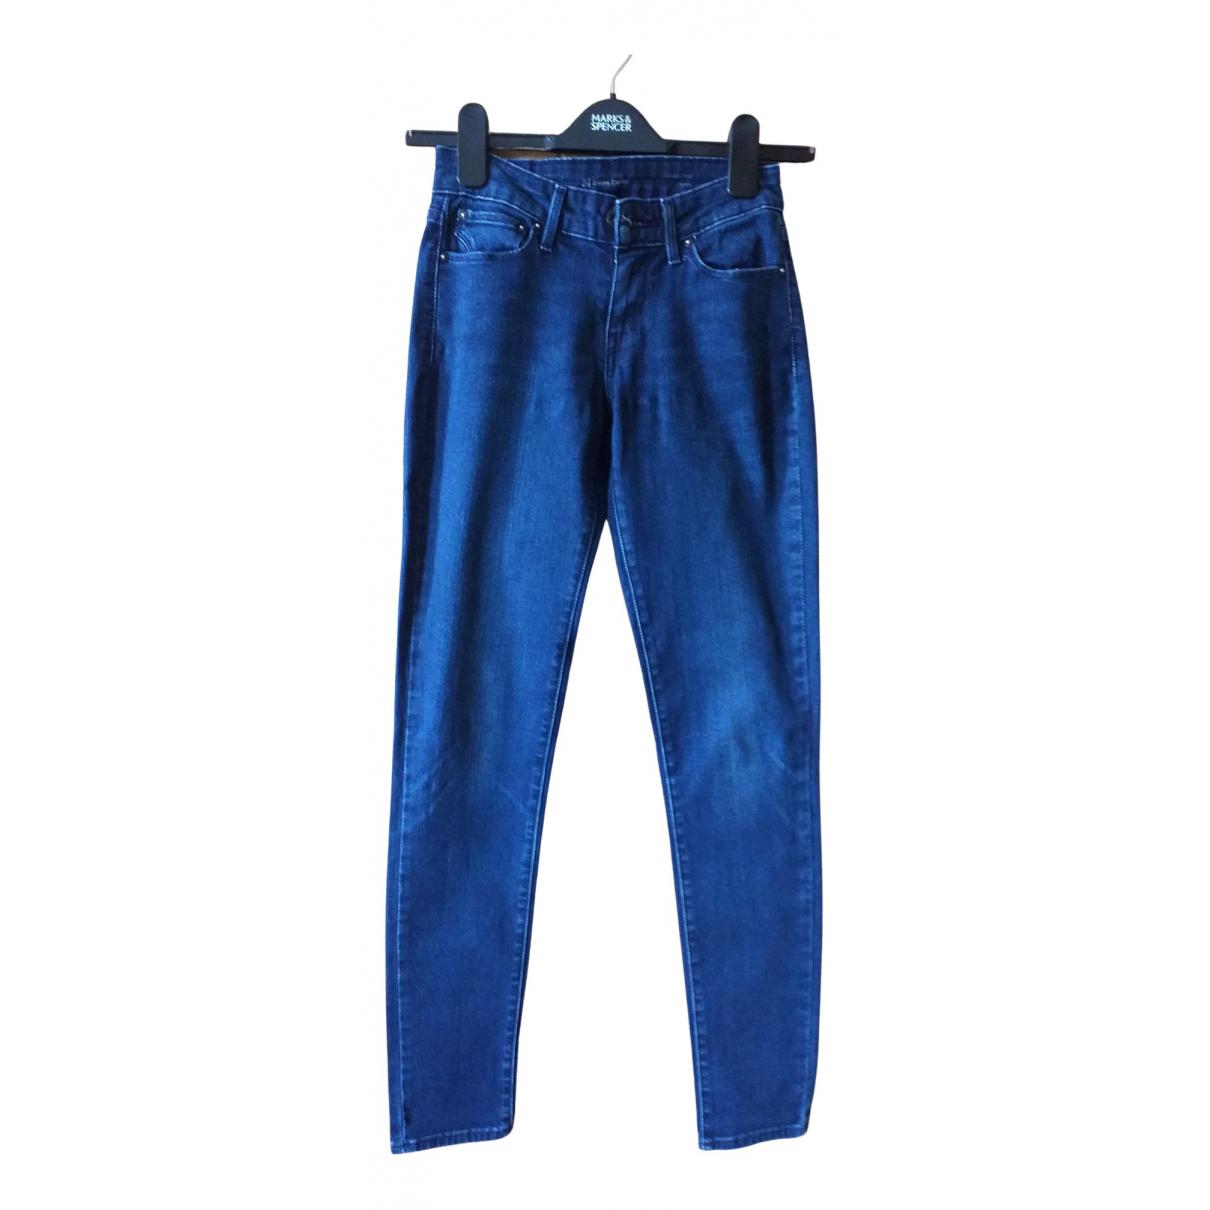 Levi's N Blue Denim - Jeans Jeans for Women 32 FR